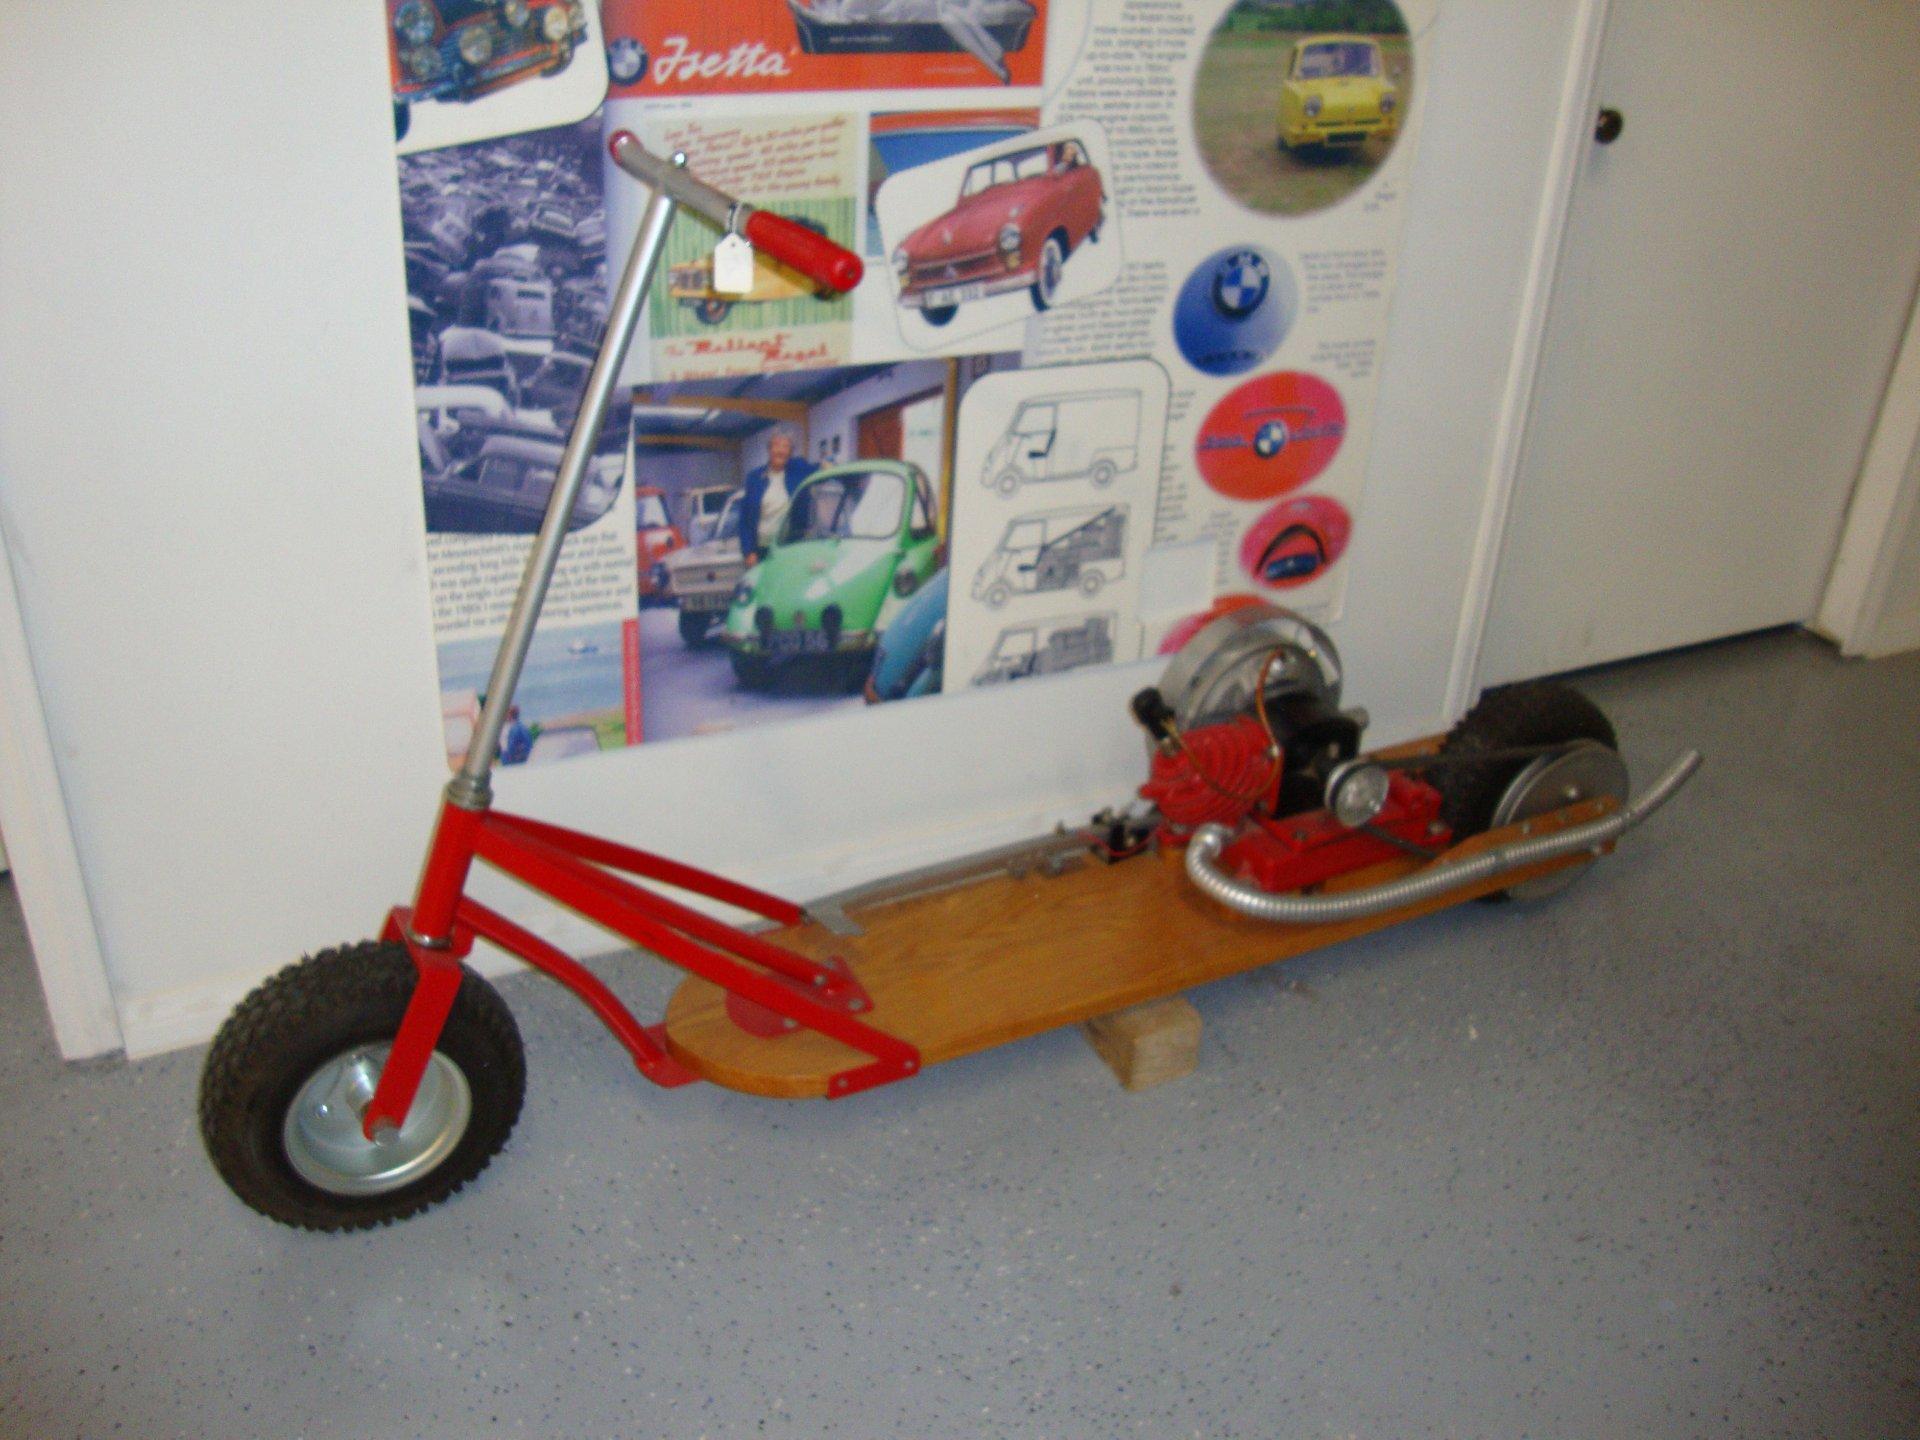 Maytag custom scooter